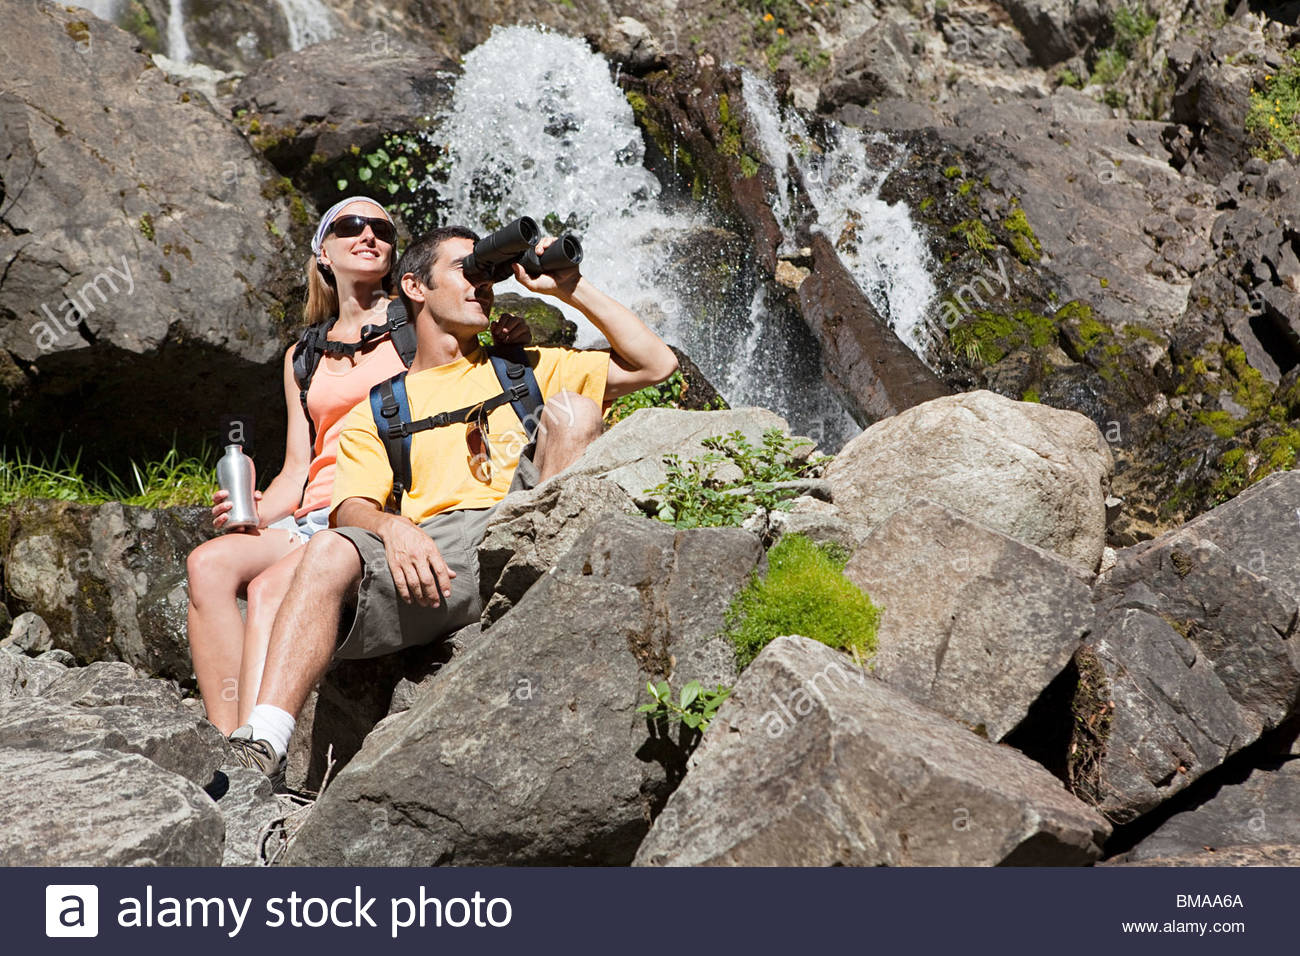 Couple by waterfall with binoculars - Stock Image